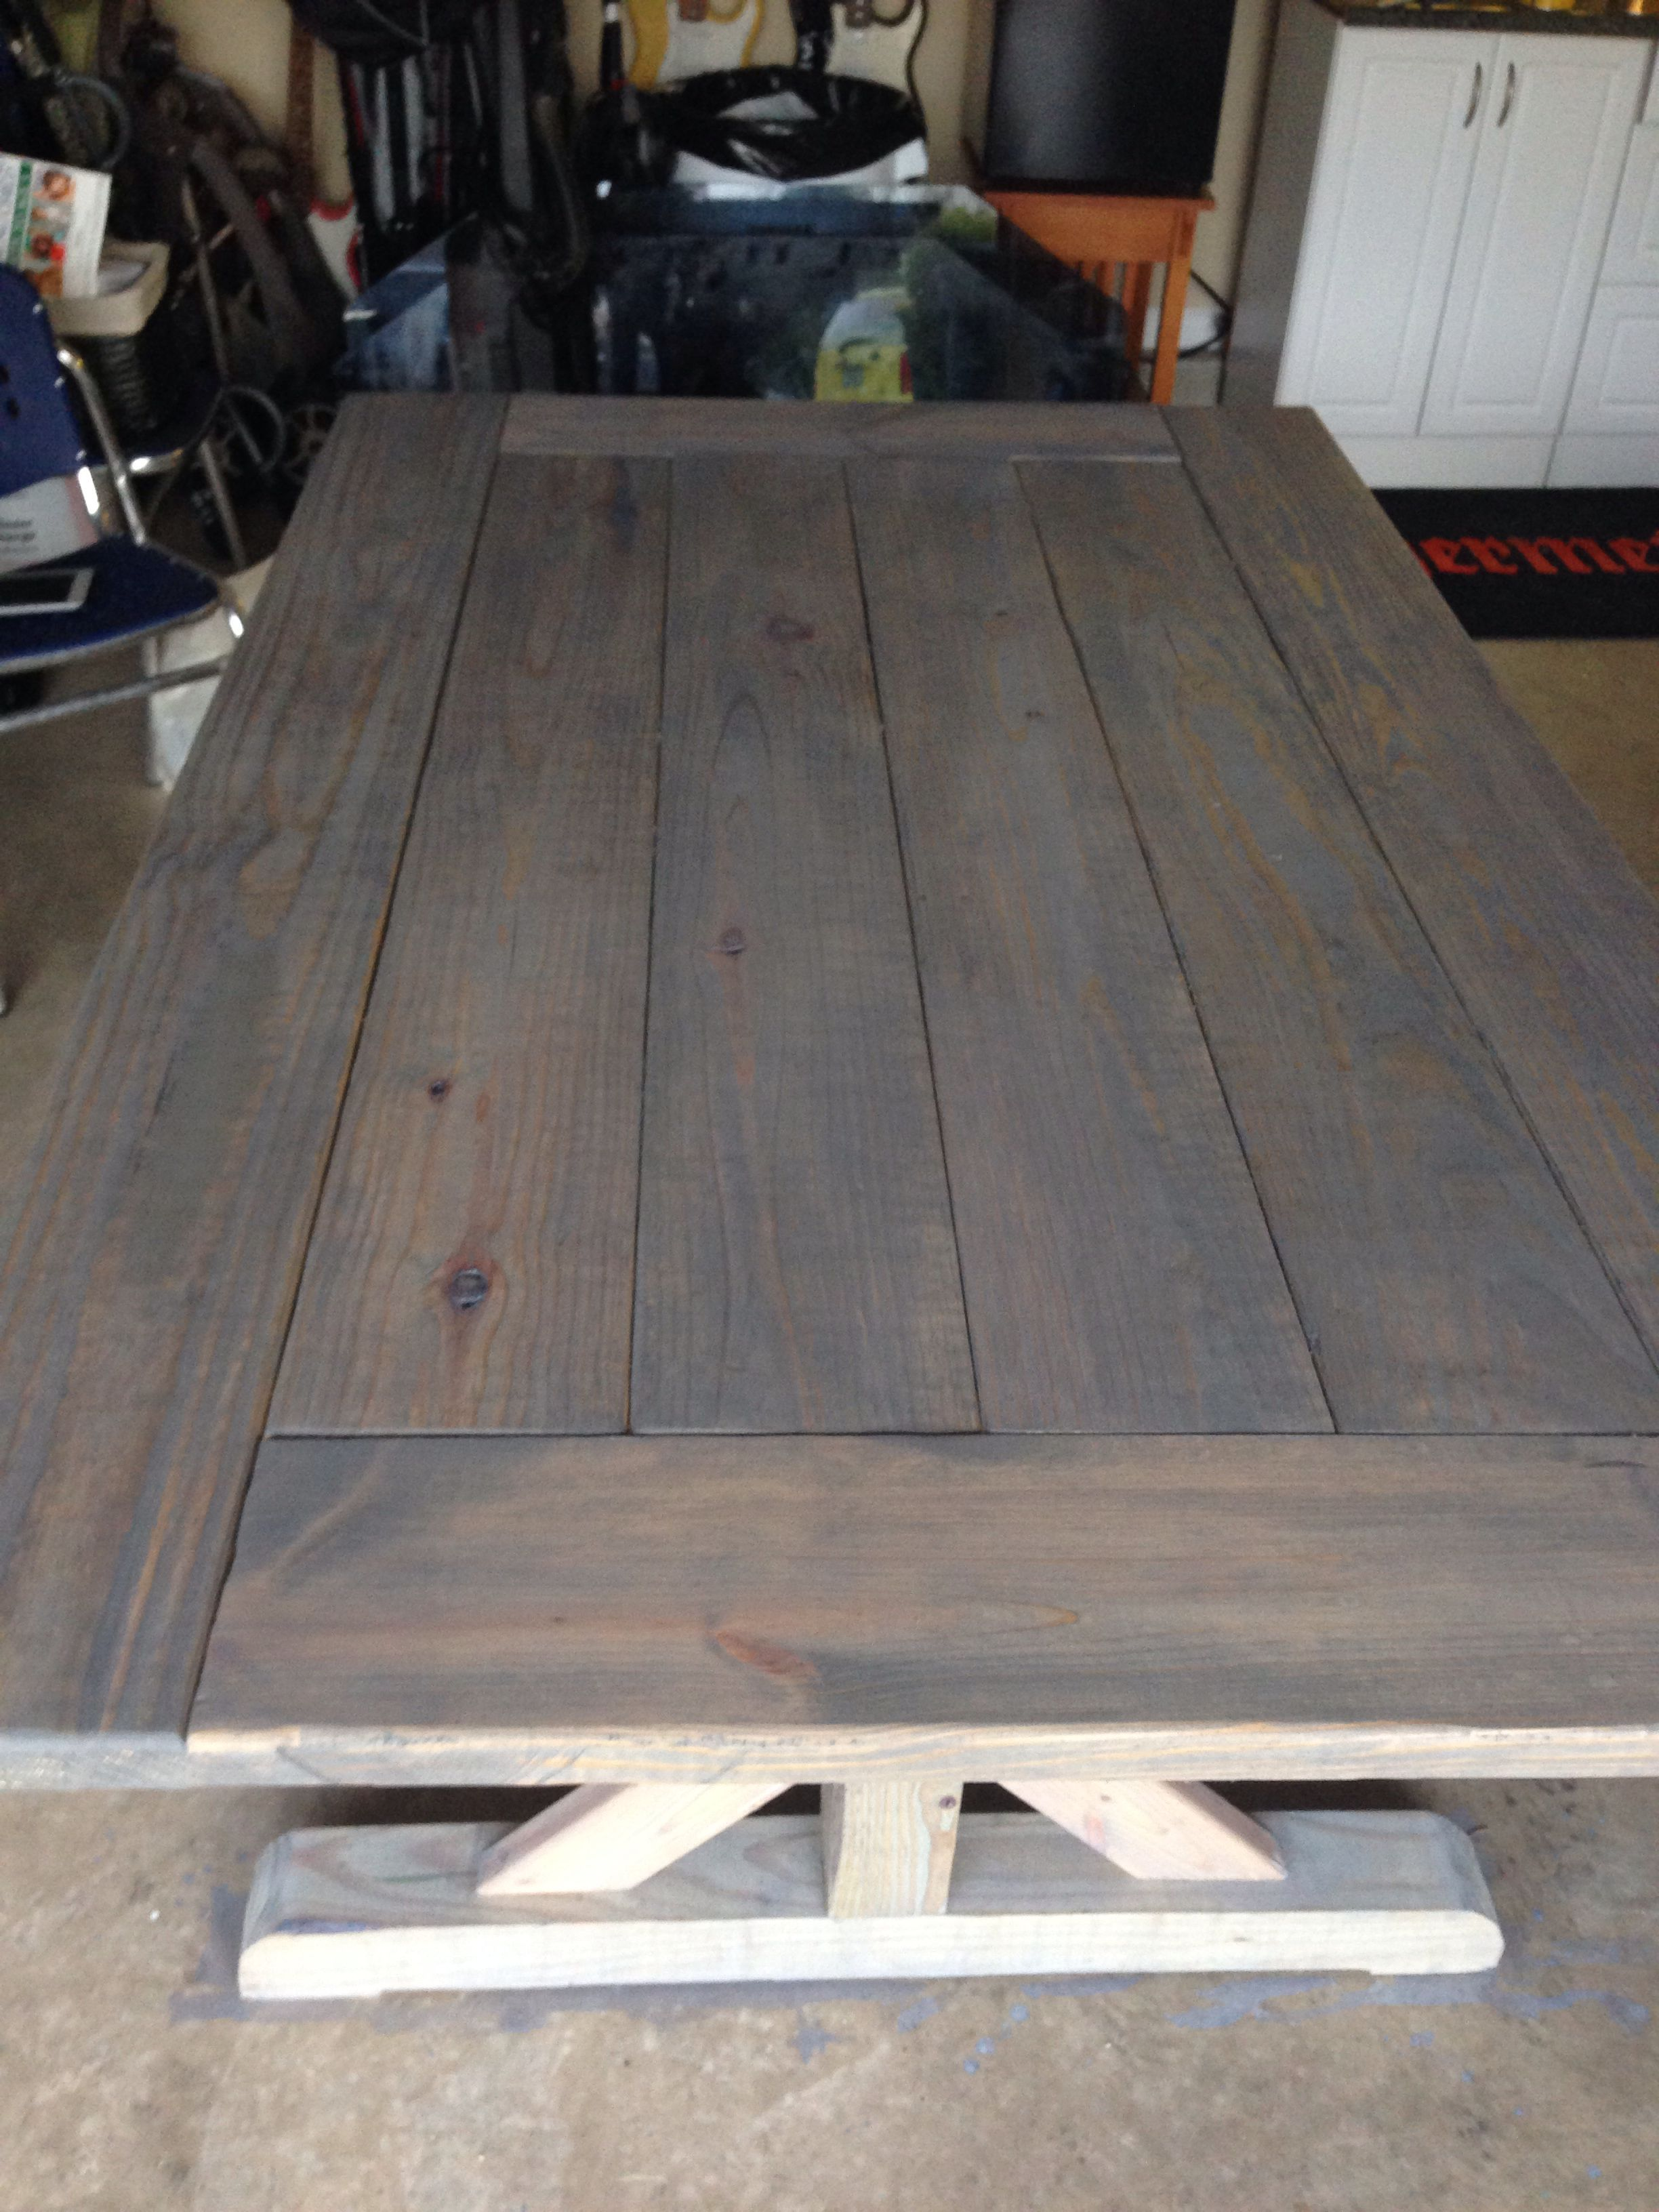 Handmade Farm House Table With Reclaimed Wood First Coat